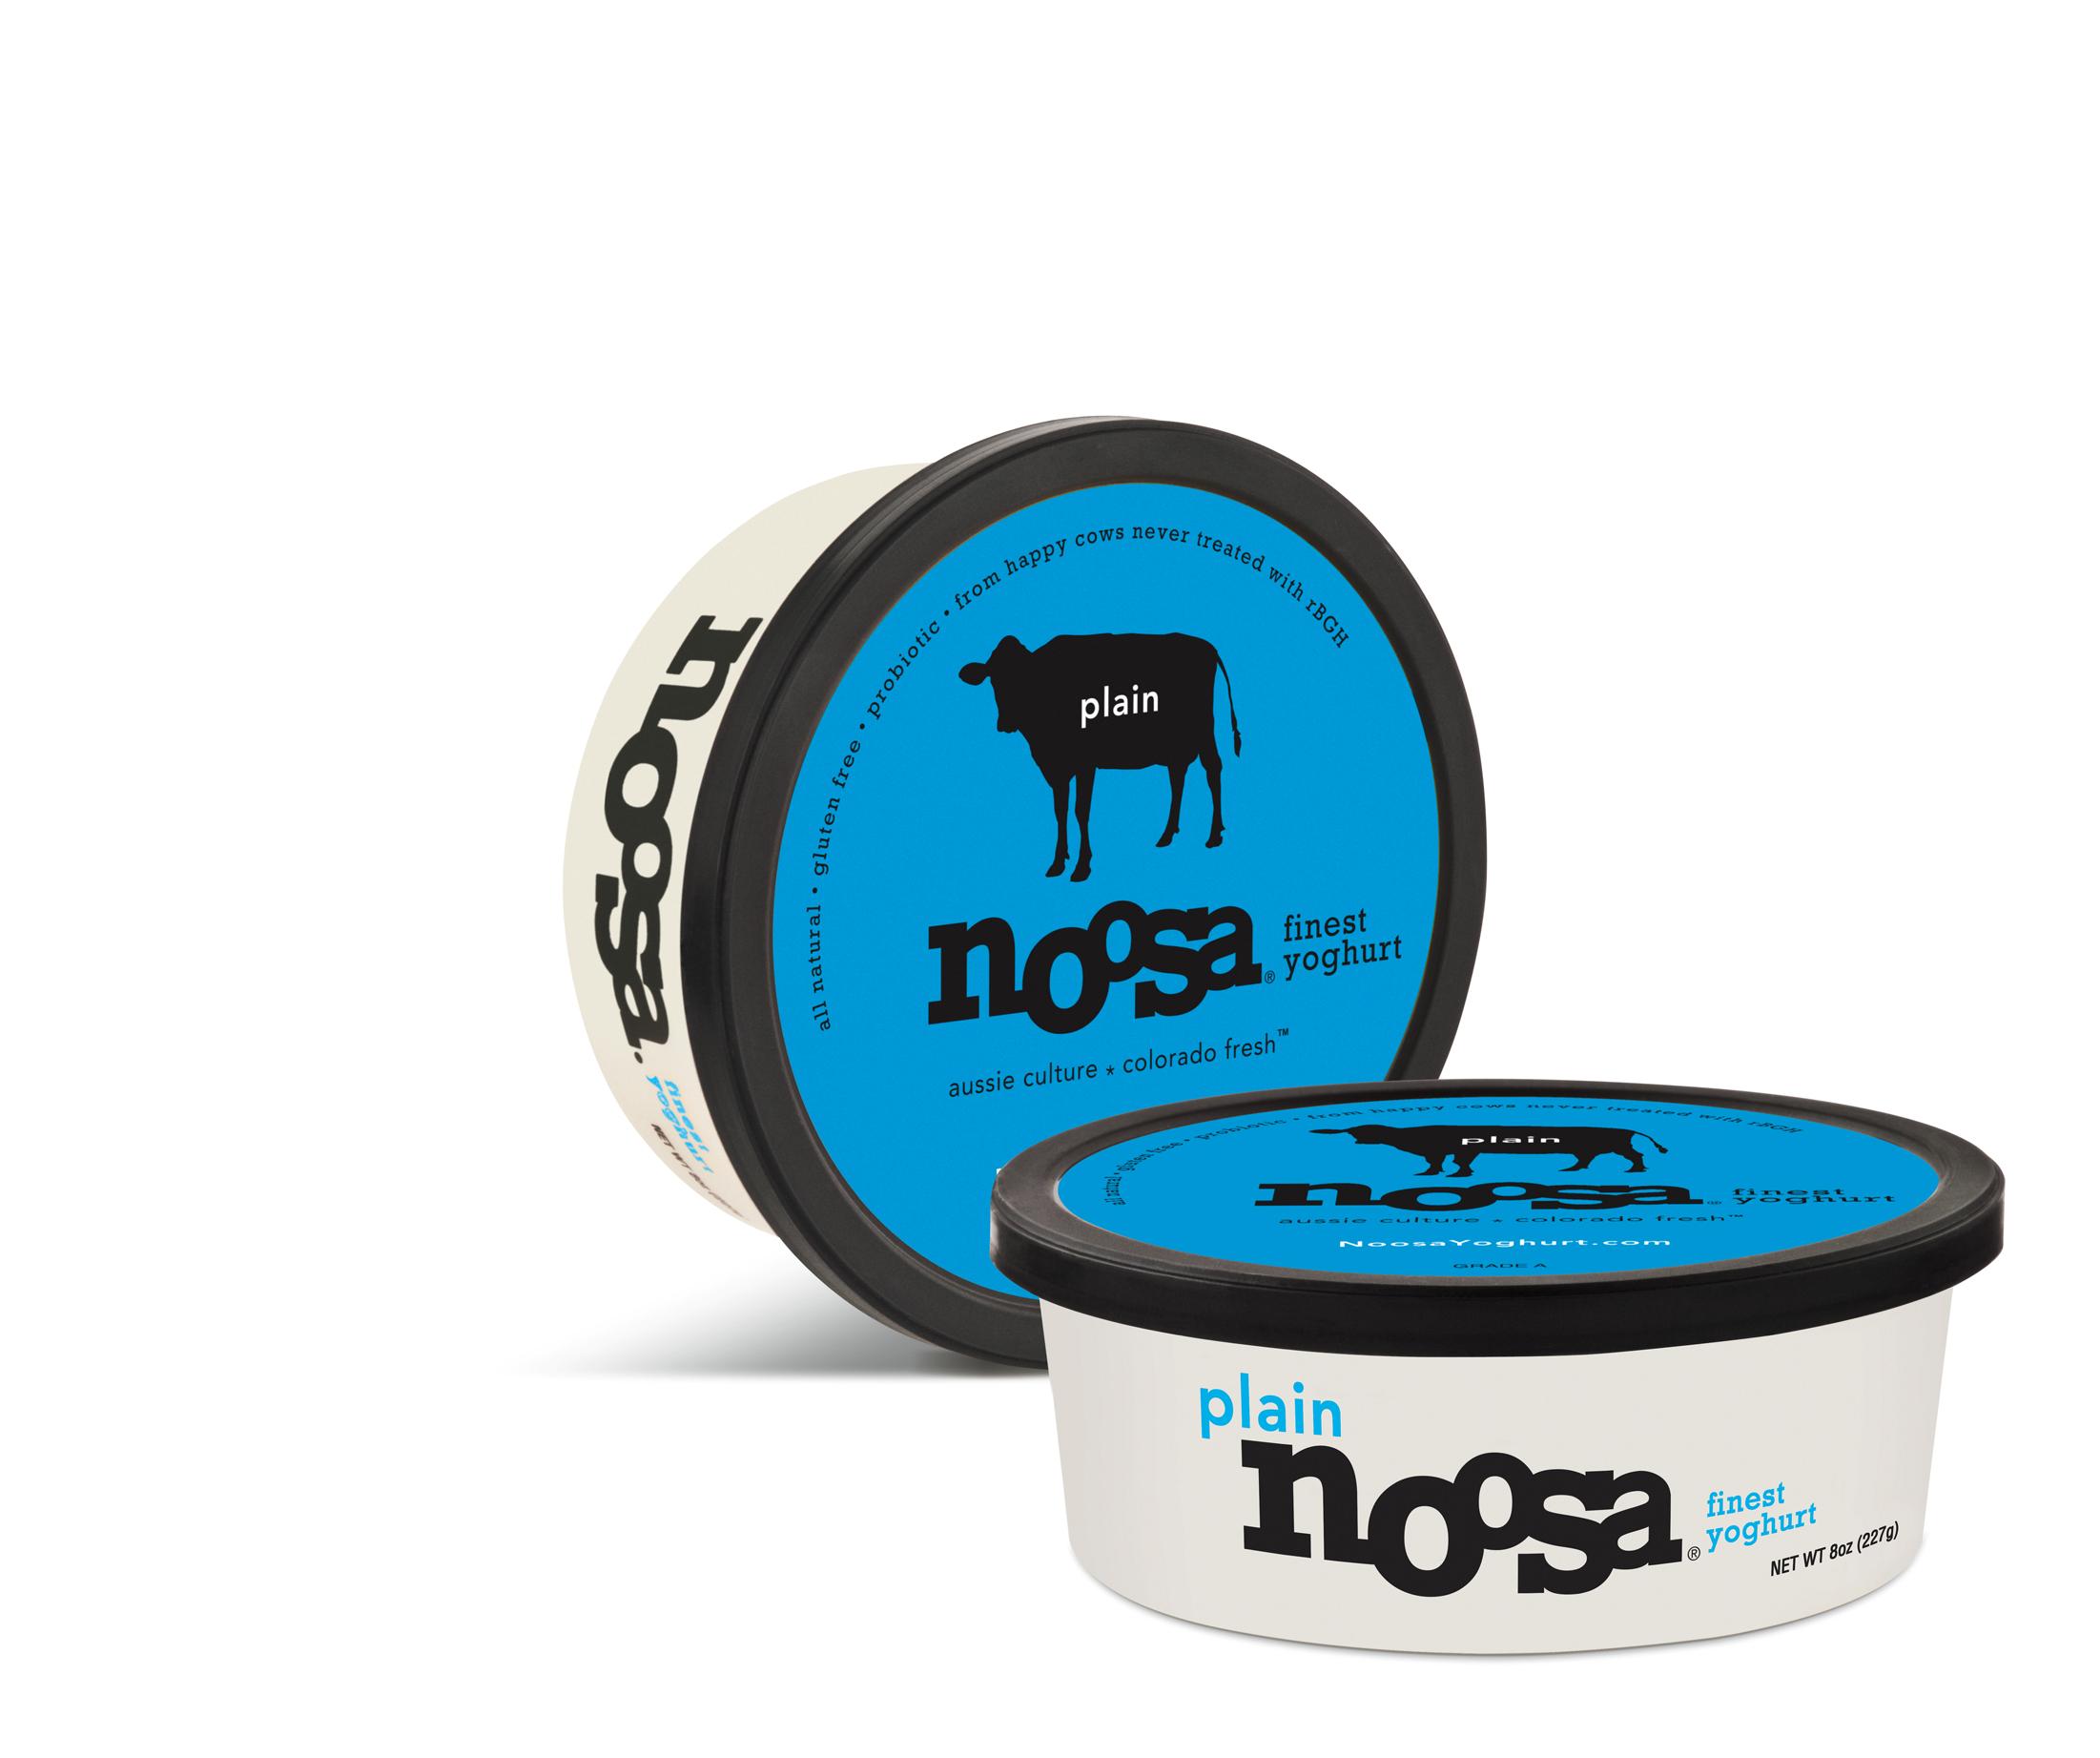 noosa pumpkin yogurt #11